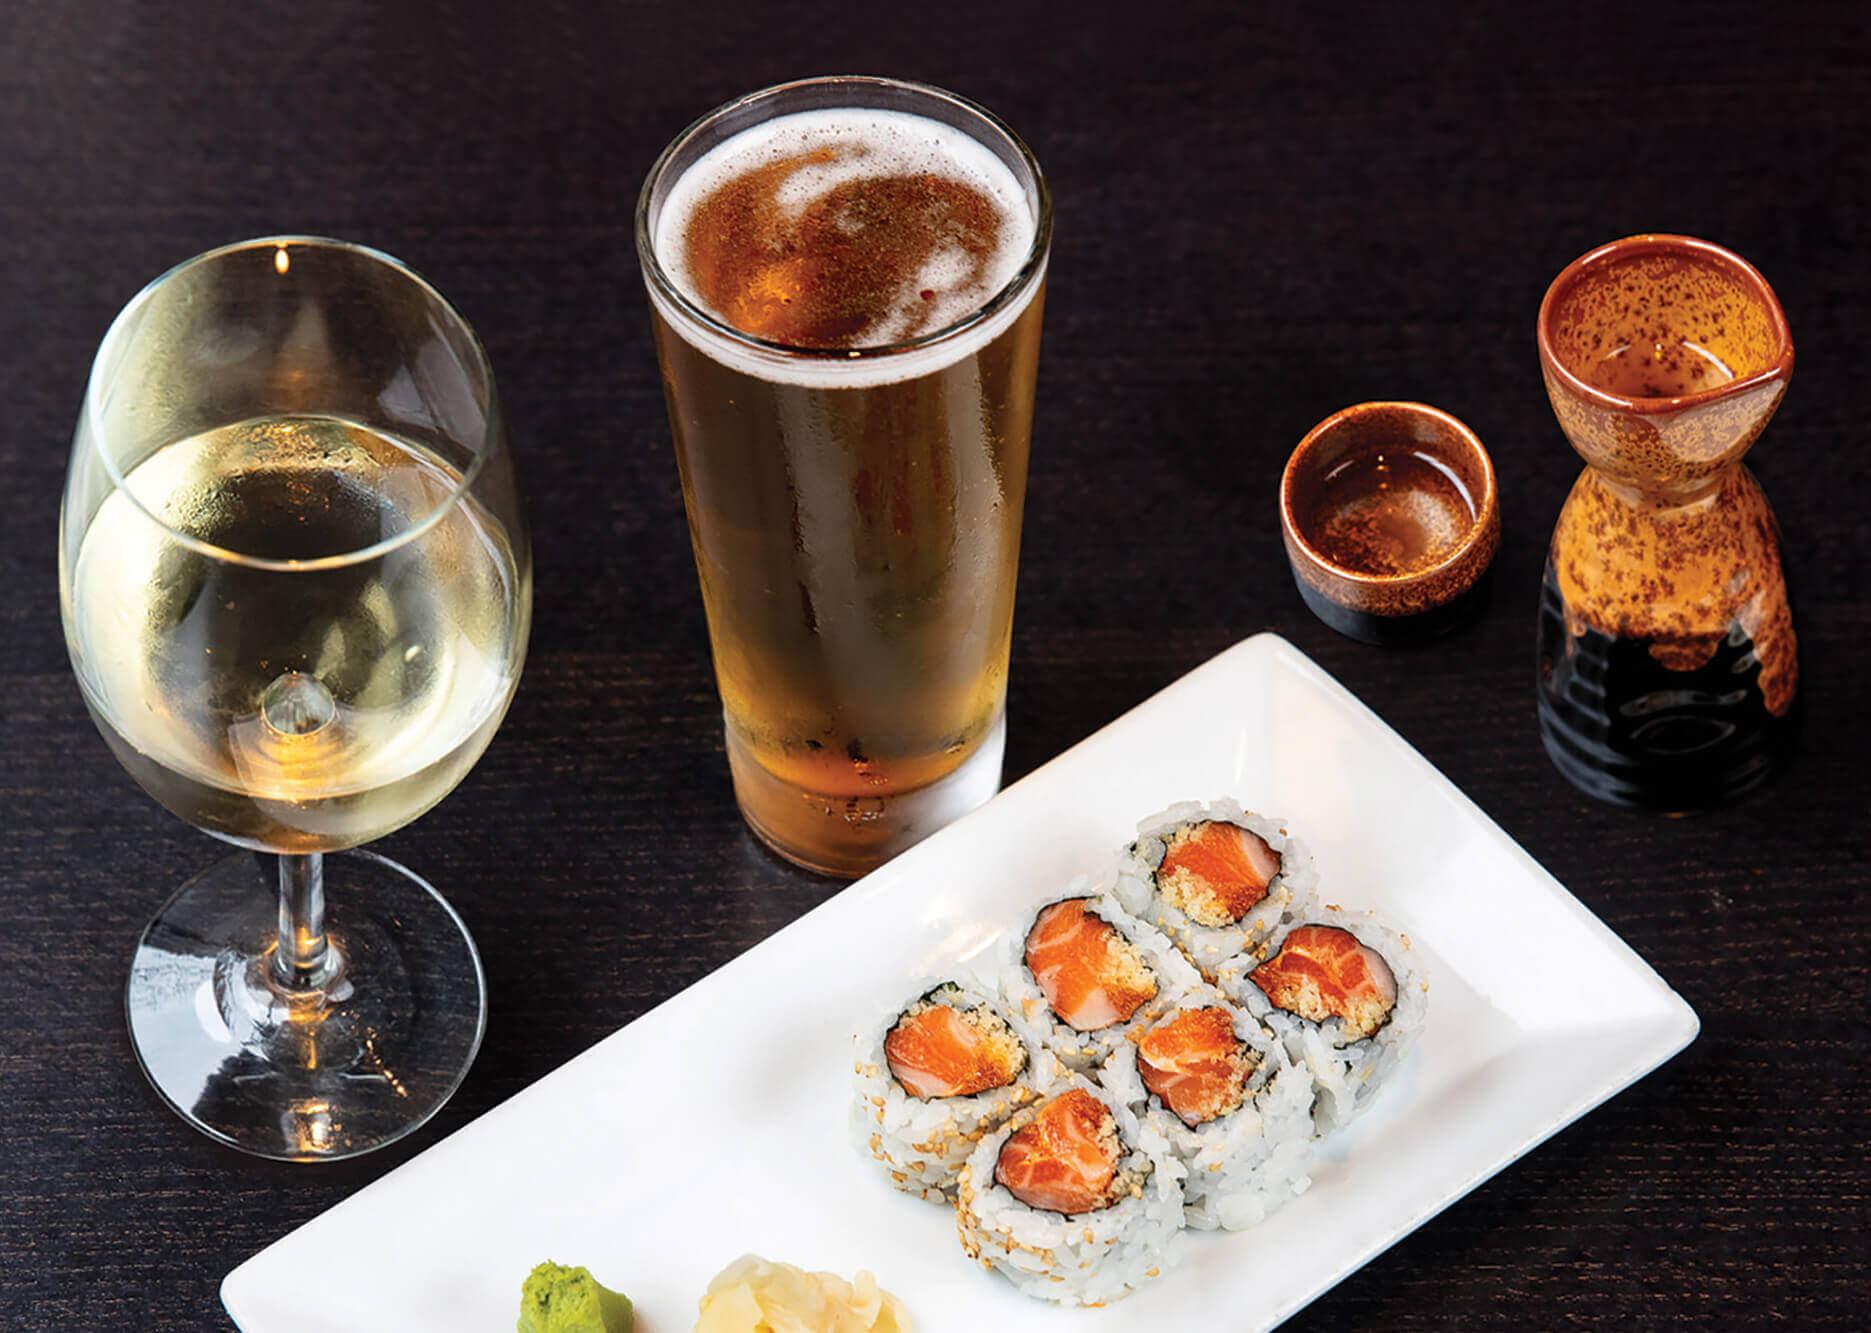 wine, beer and sake